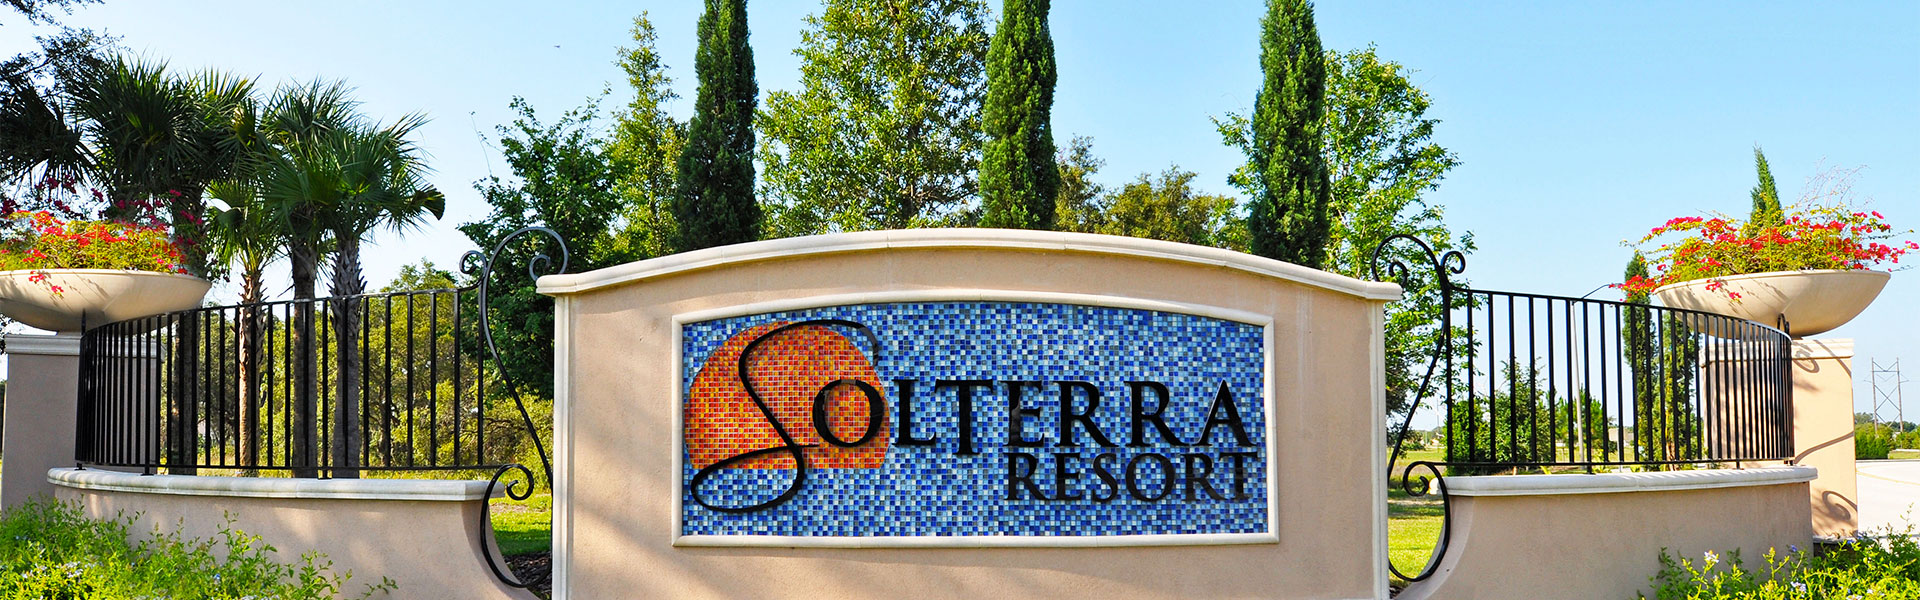 Solterra Sign